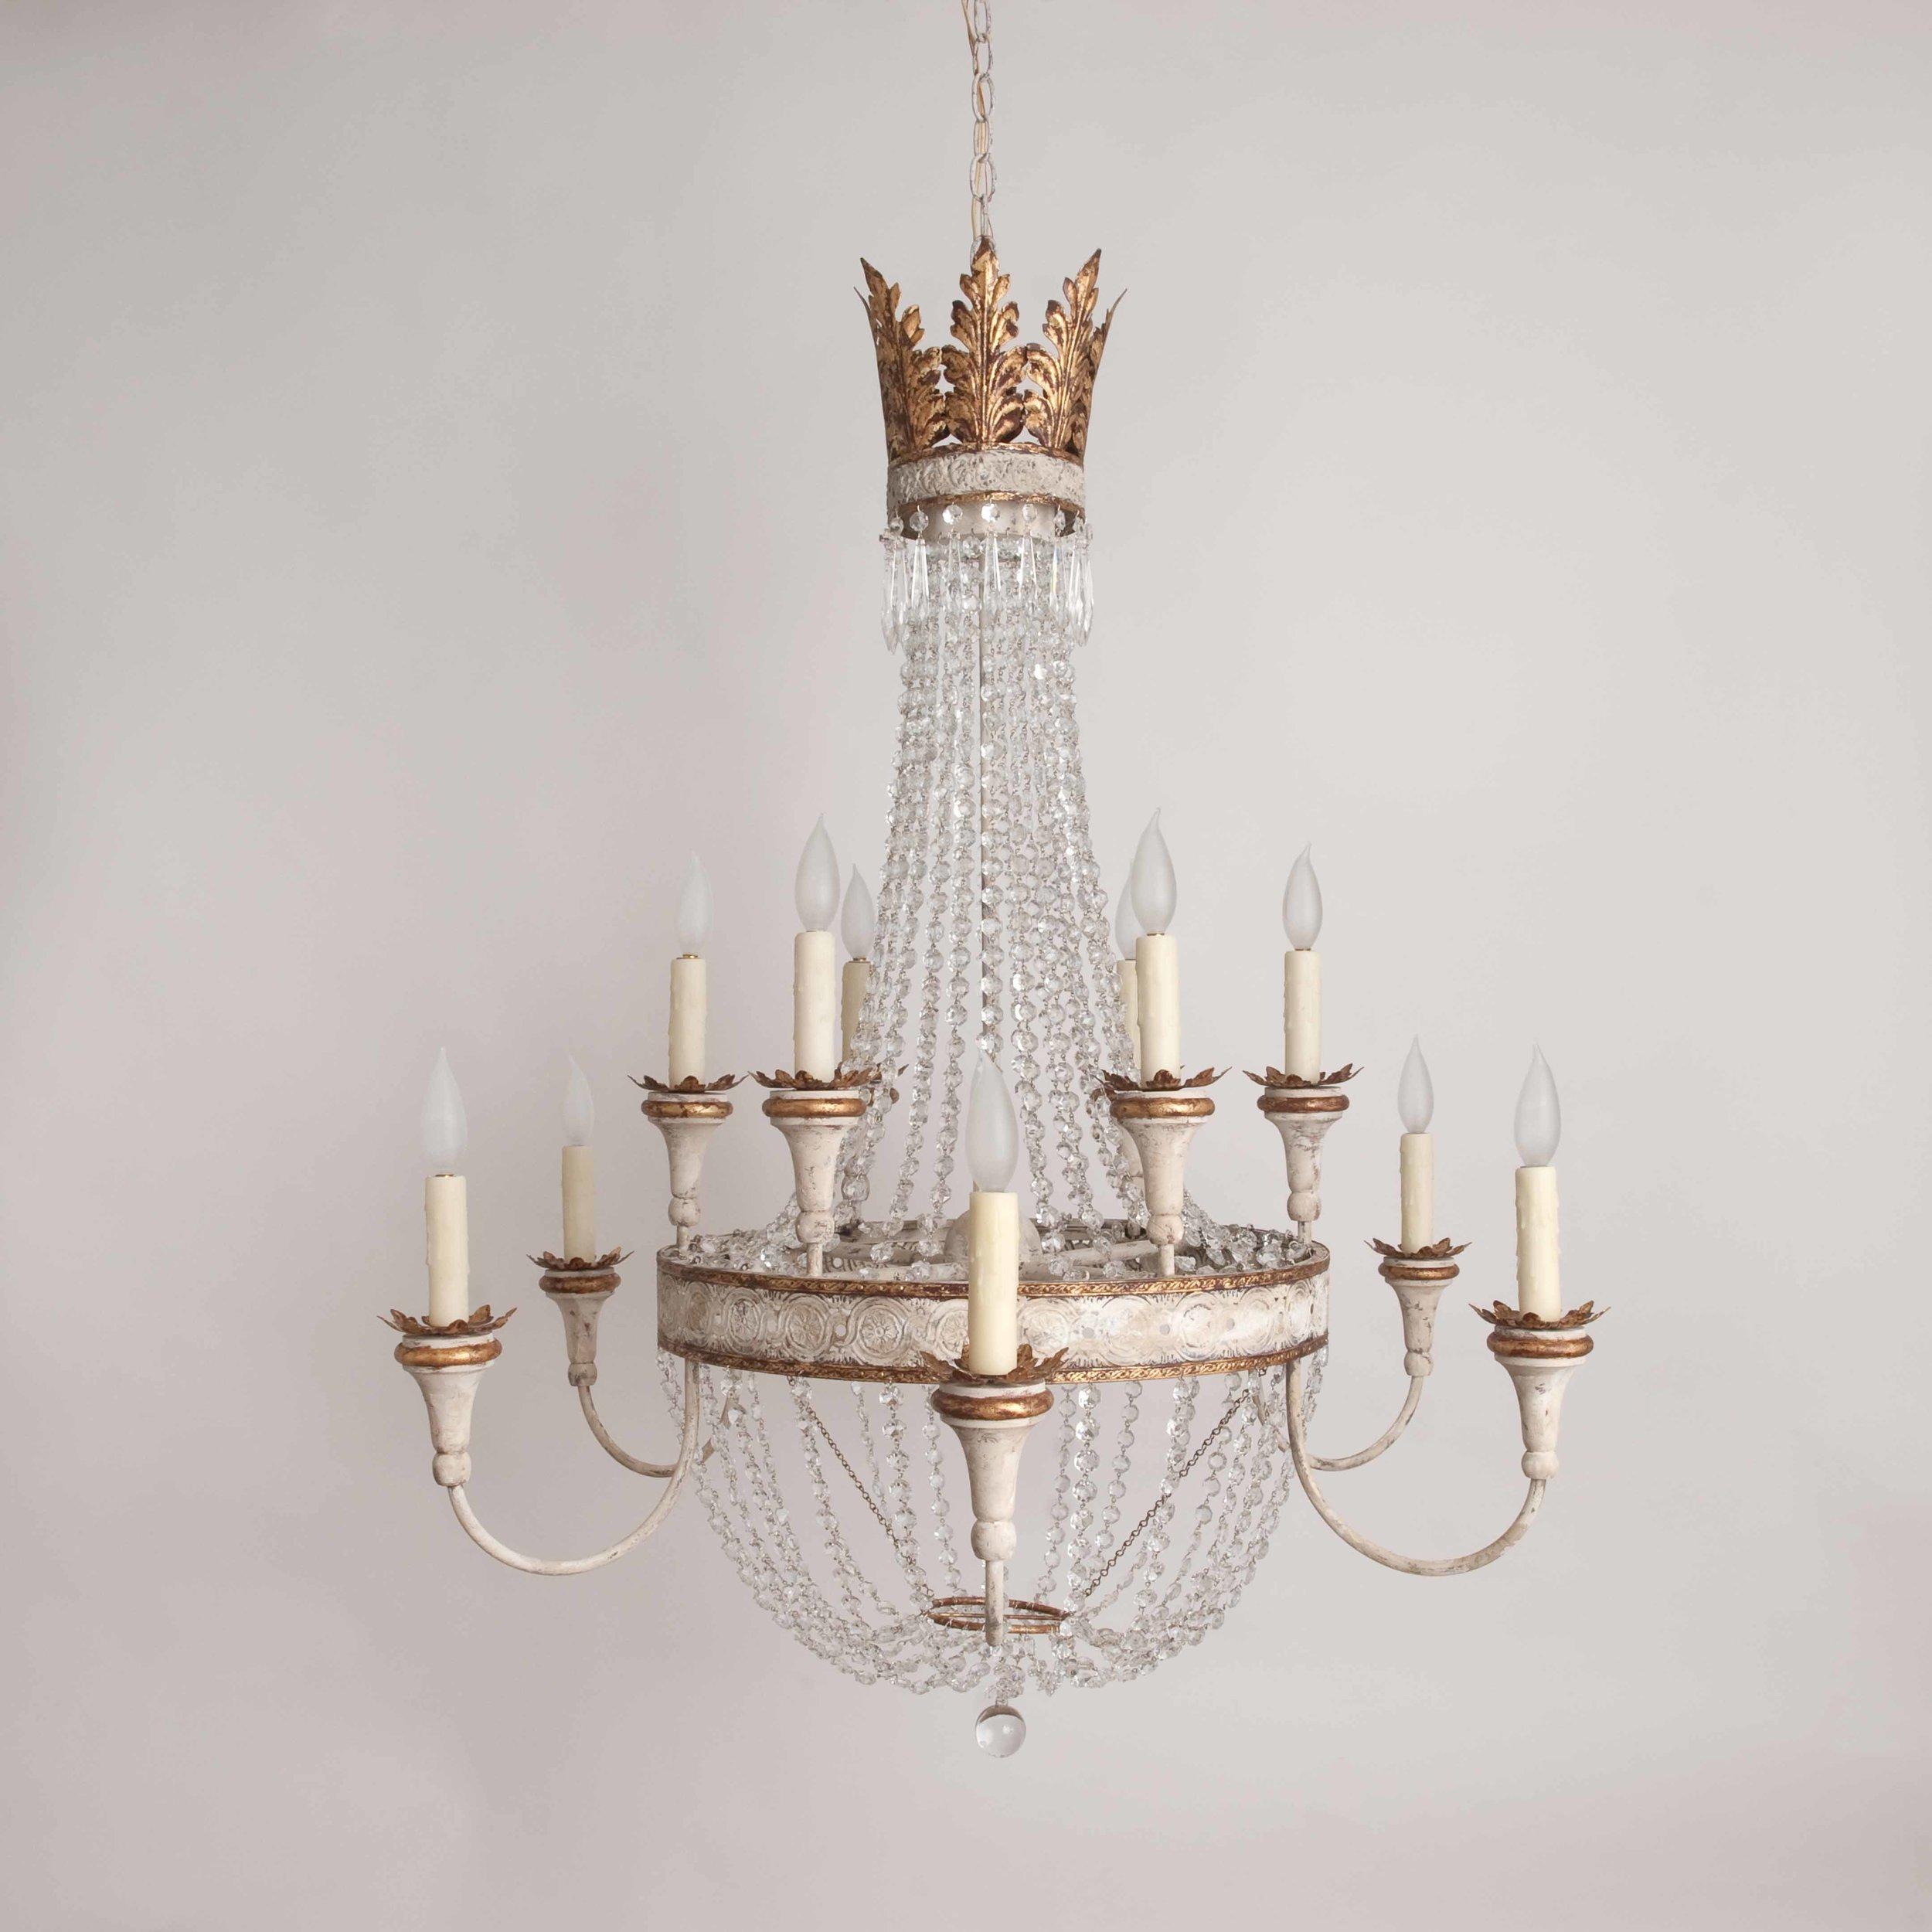 lizette chandelier-3.jpg